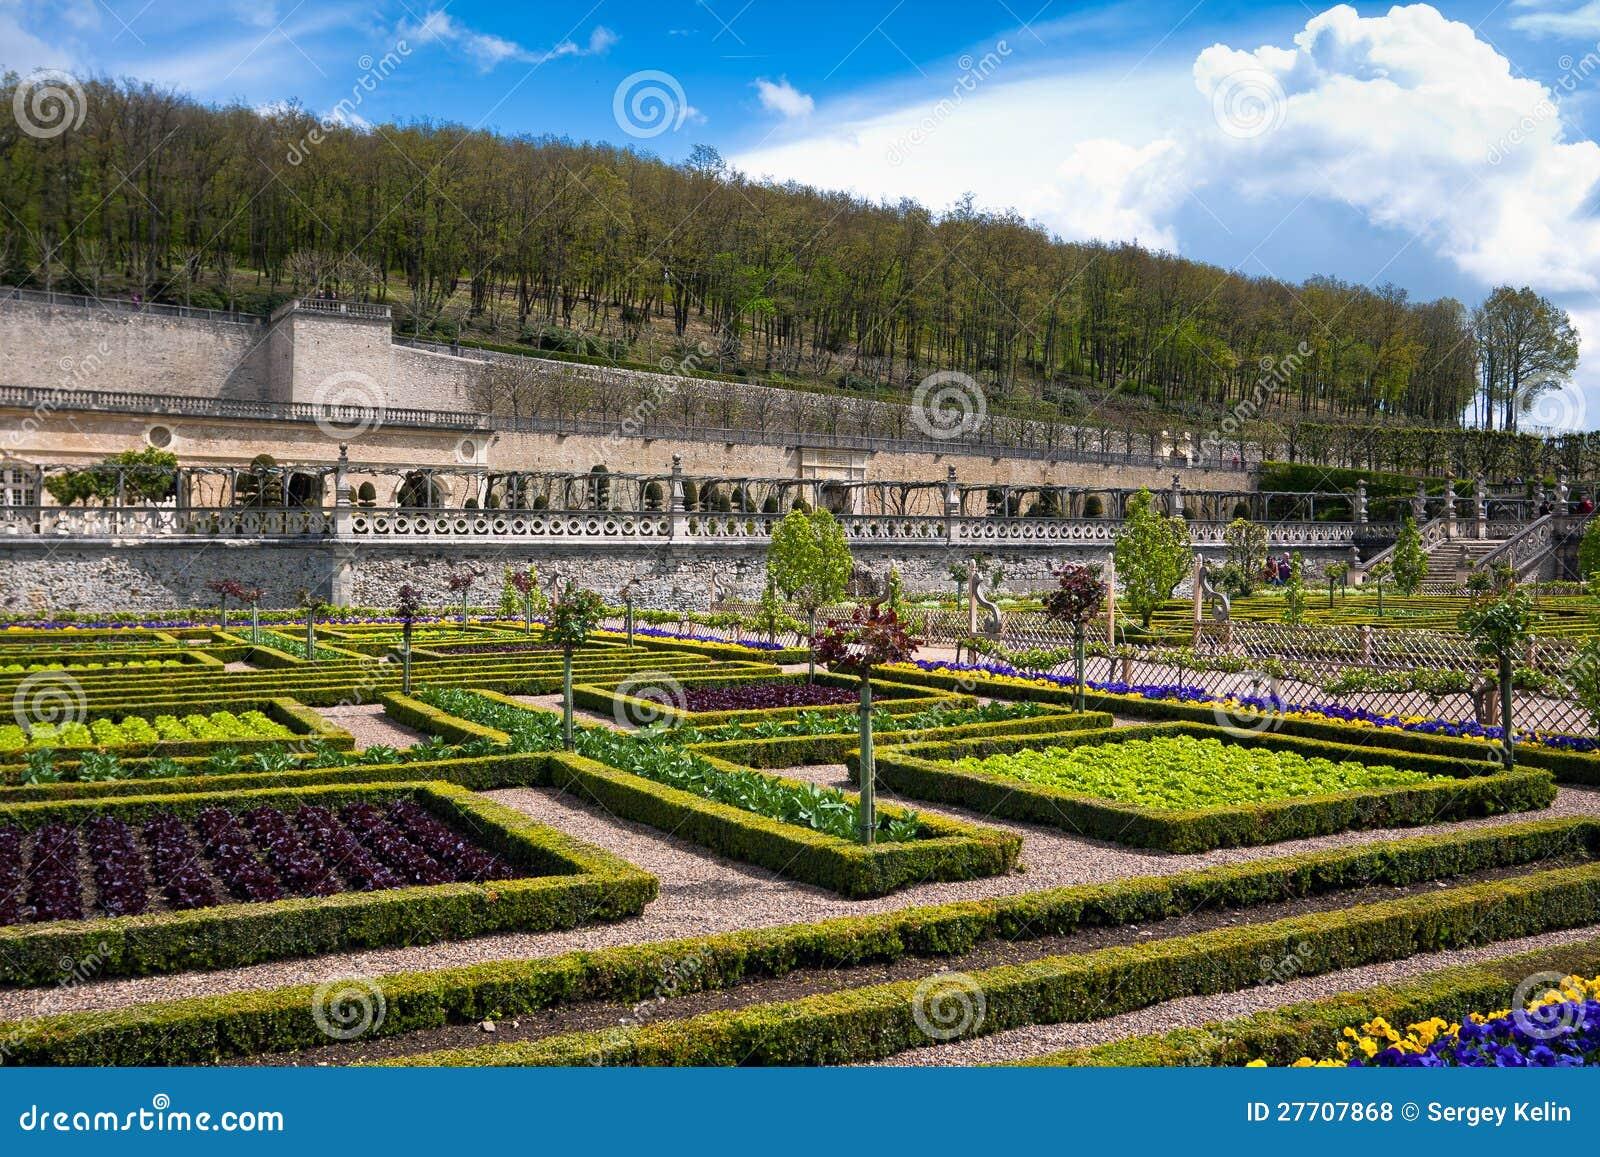 Gardens chateau de villandry frankrijk royalty vrije stock foto 39 s afbeelding 27707868 - Tuin decoratie buitenkant ...